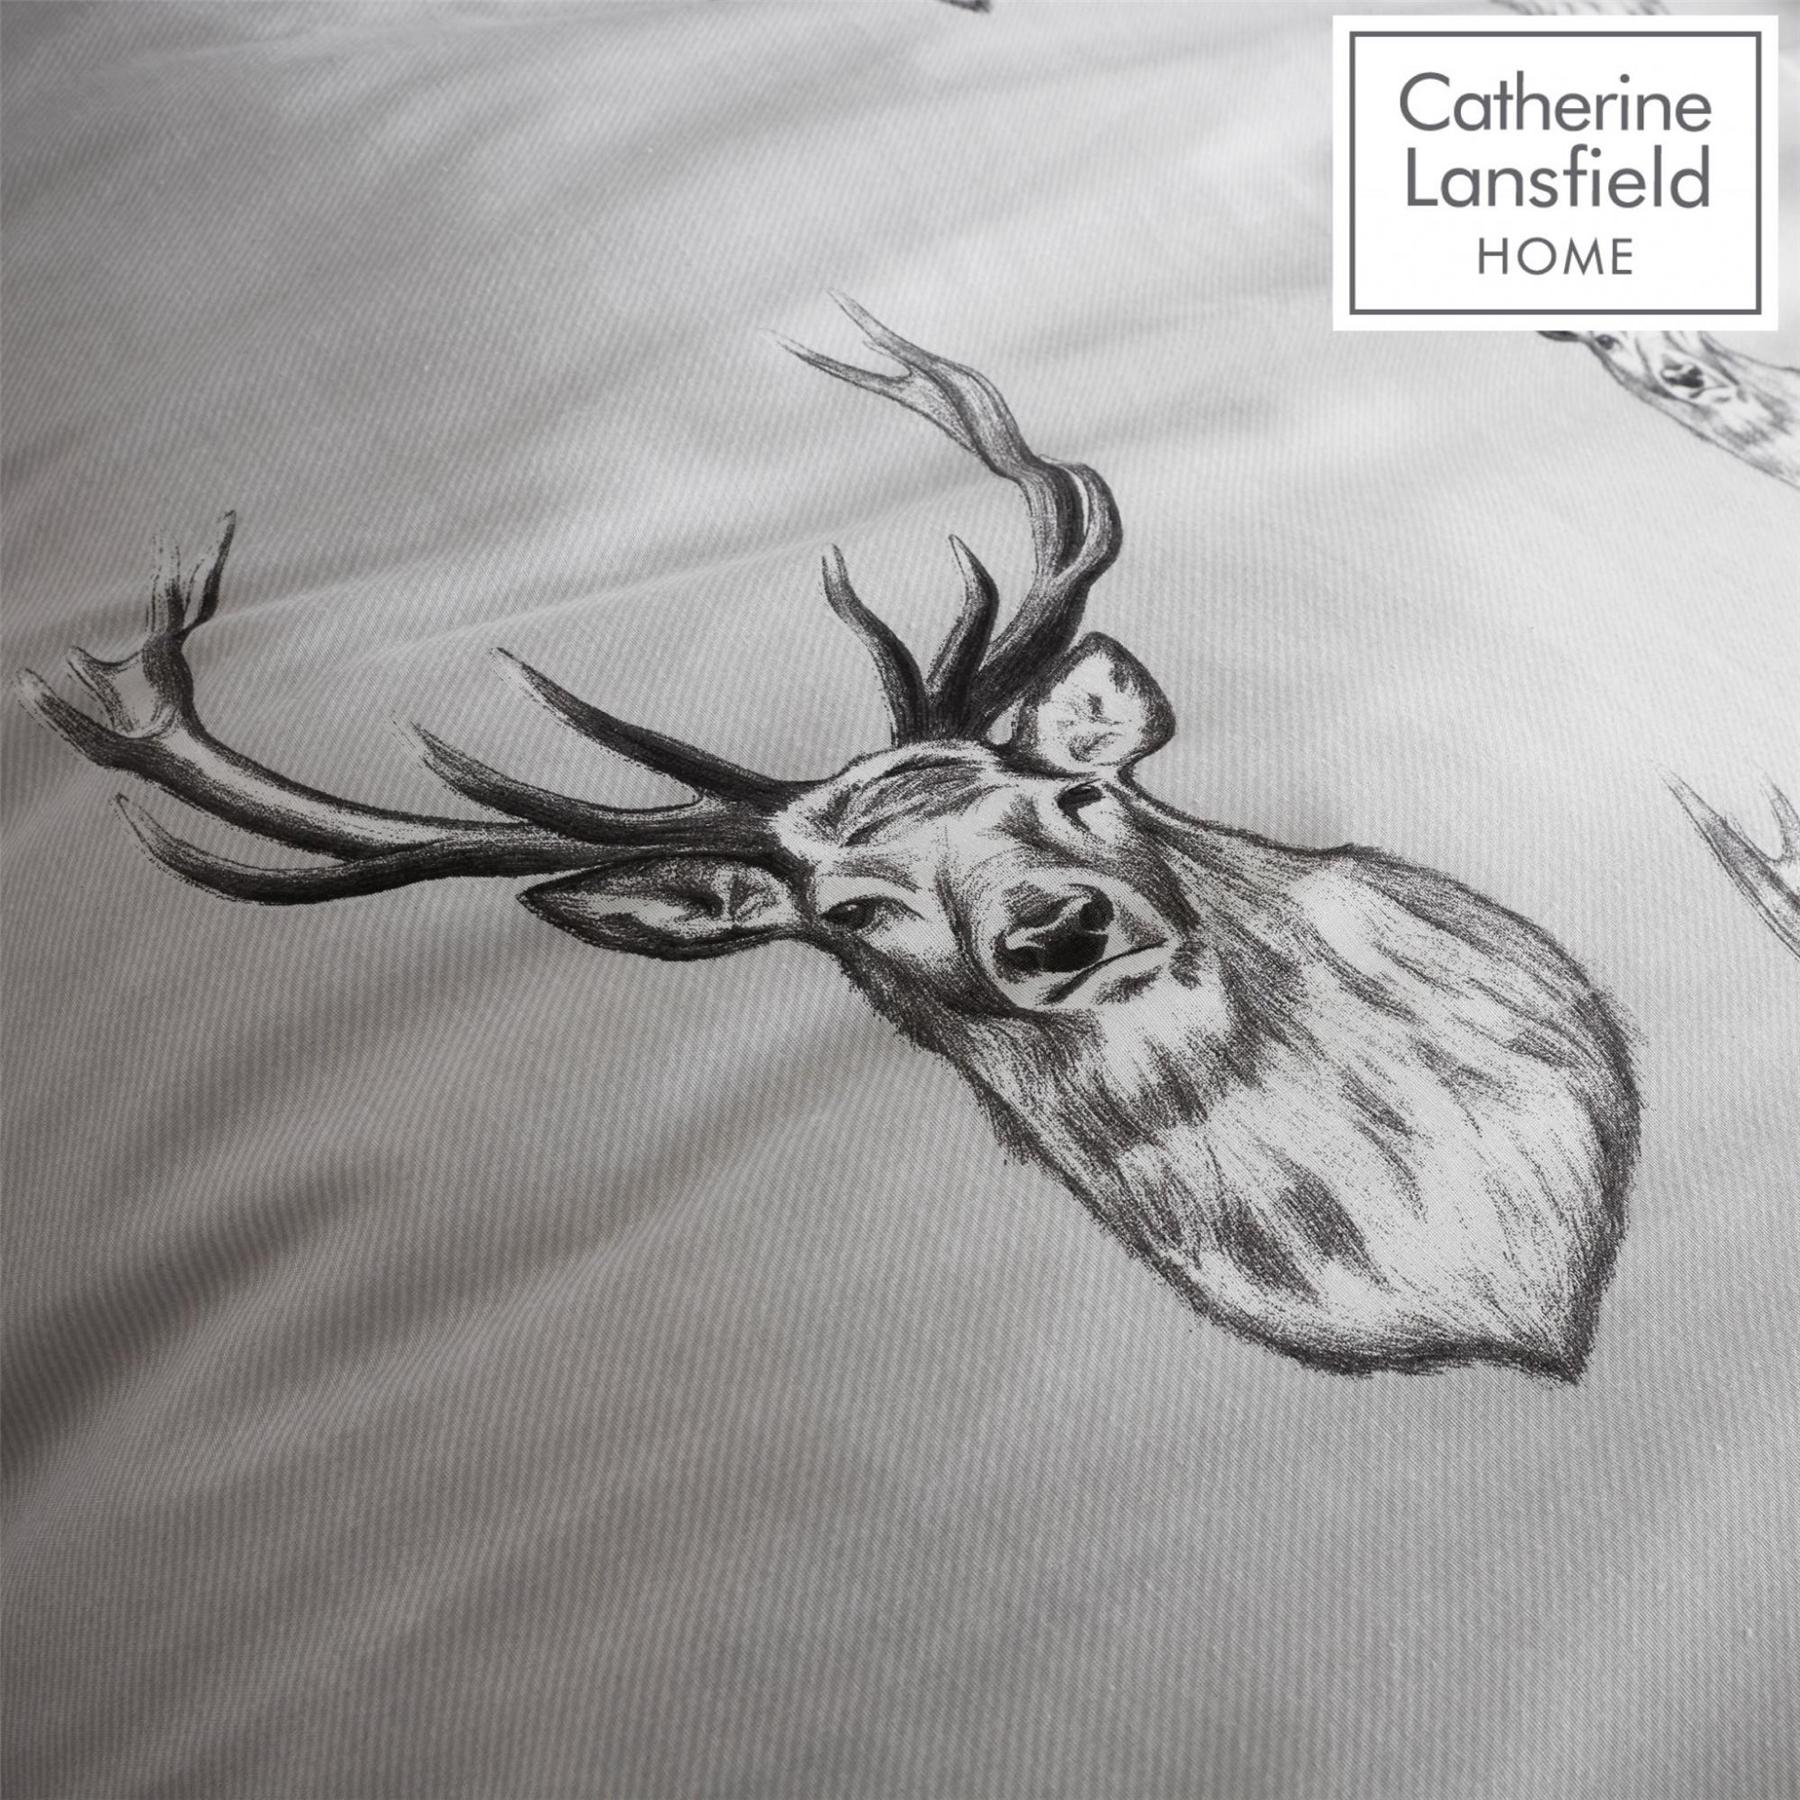 Catherine-Lansfield-Duvet-Set-Highland-Stag-Reversible-Check-Bedding-Grey thumbnail 20